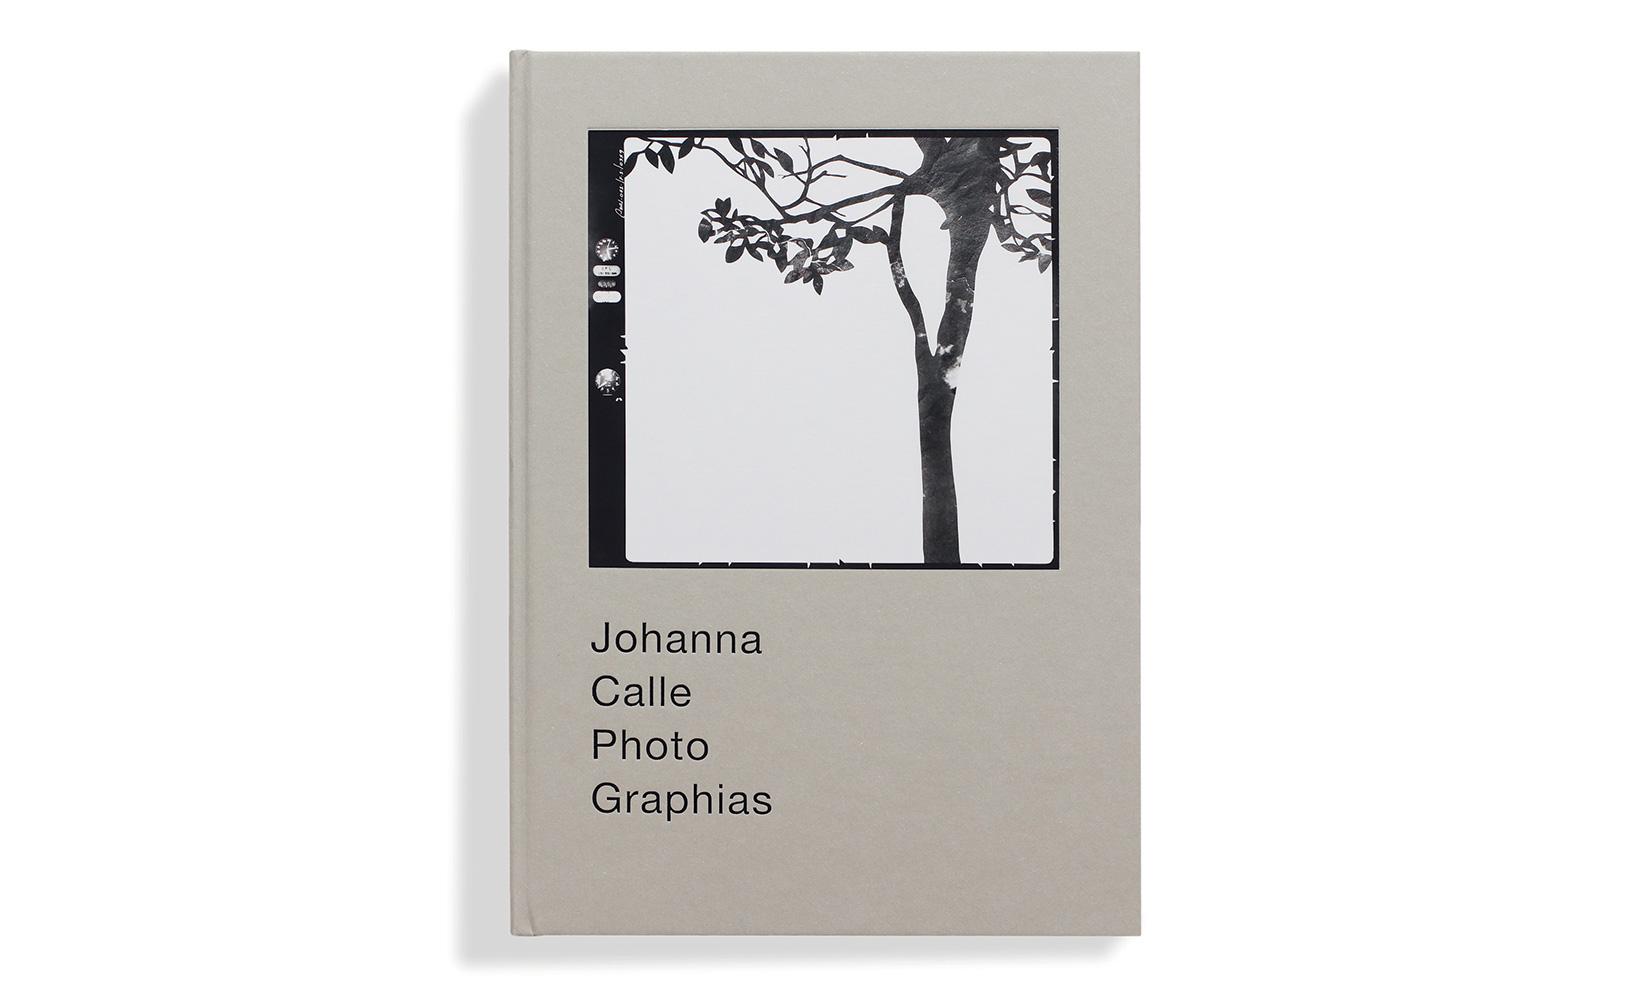 JOHANNA-CALLE-TOLUCA-STUDIO-OLIVIER-ANDREOTTI-FACE.jpg